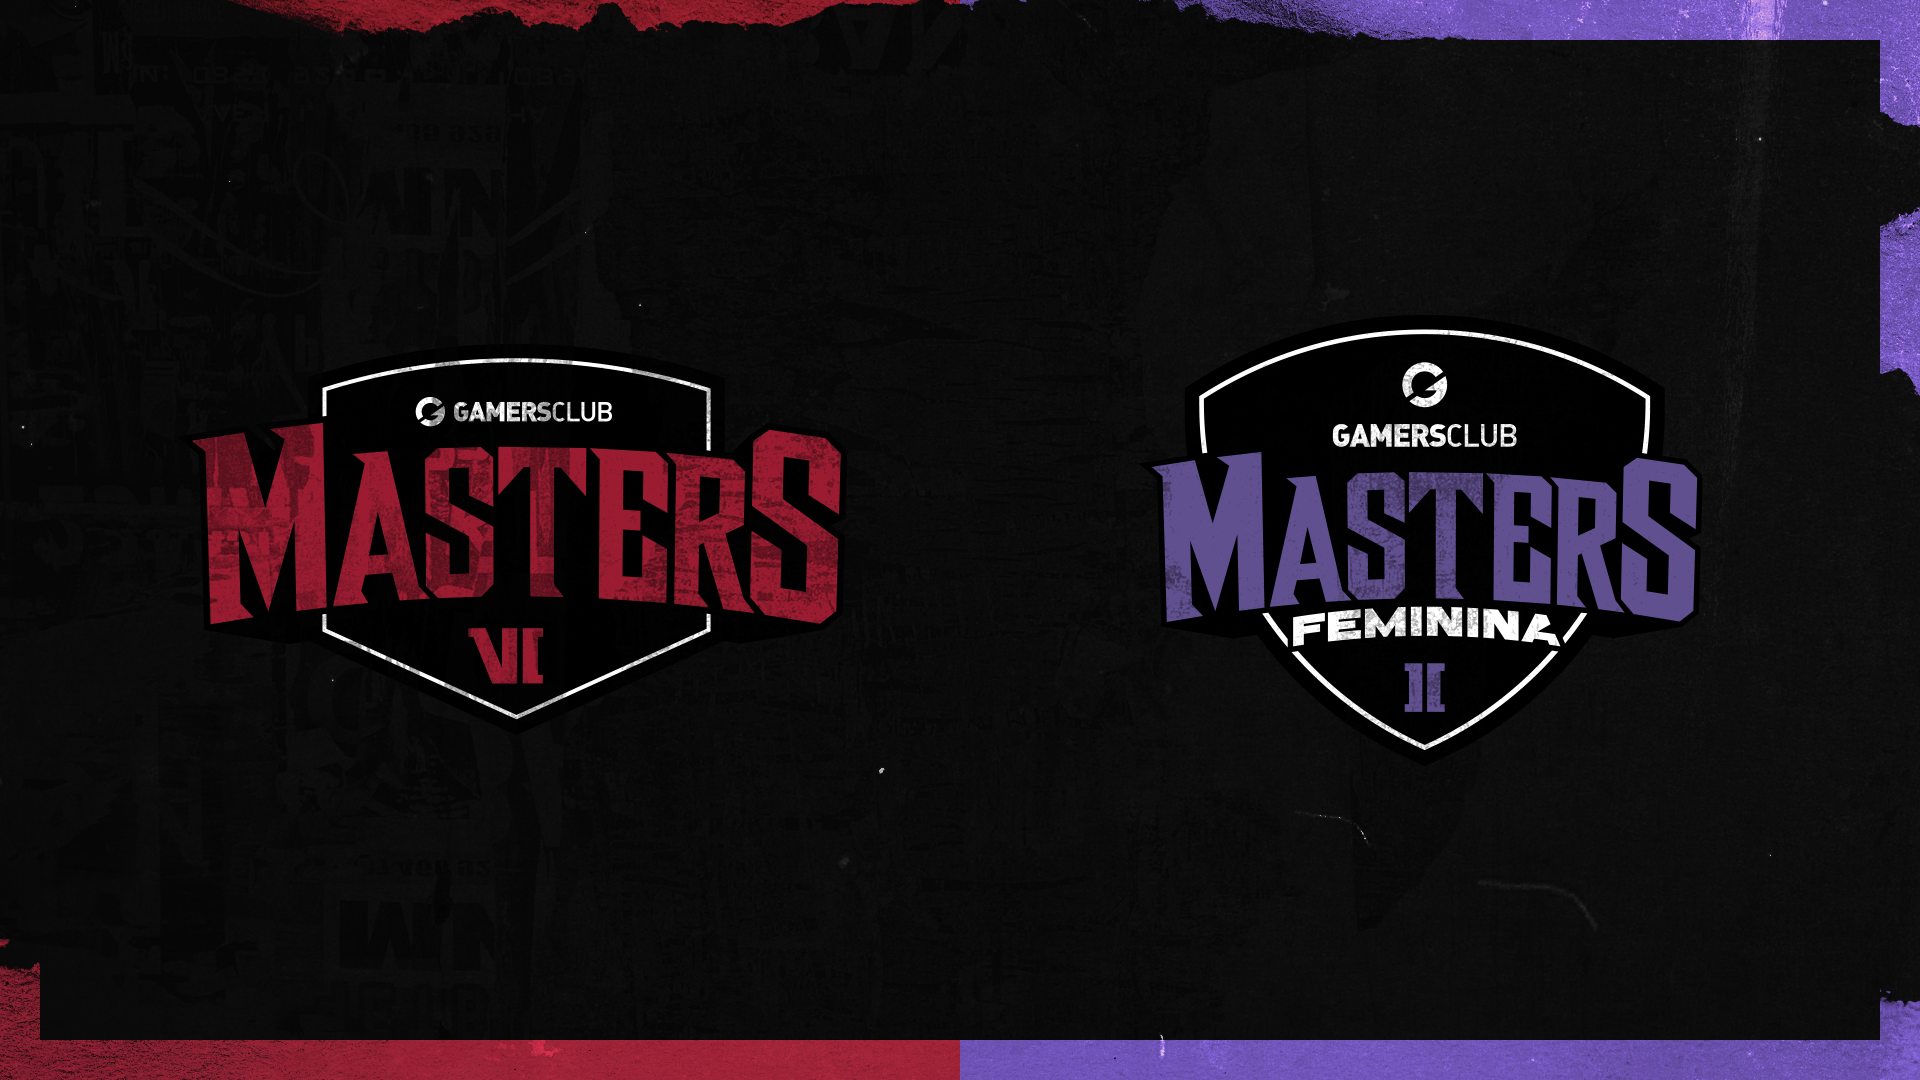 GC Masters VI e GC Masters Feminina II